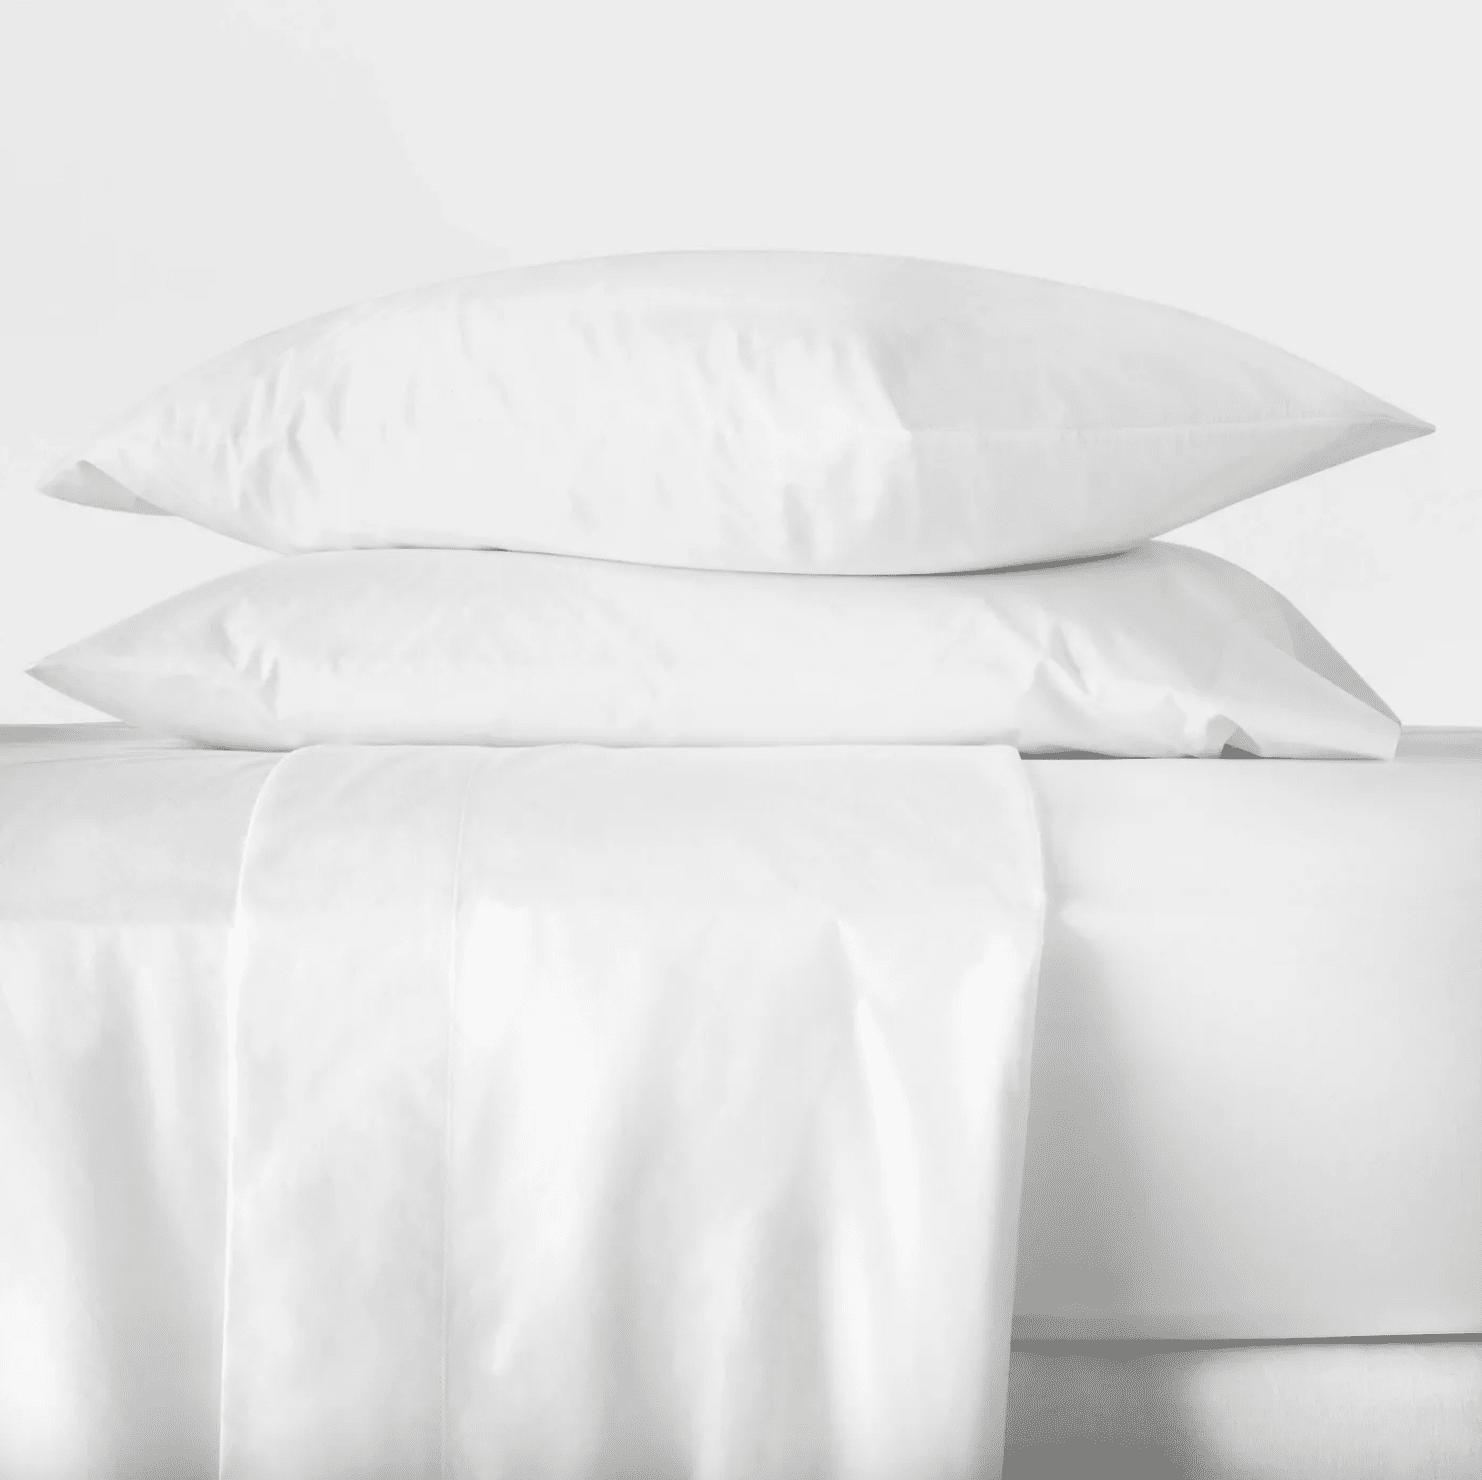 Target - Washed Supima Percale Solid Sheet Set - Casaluna™